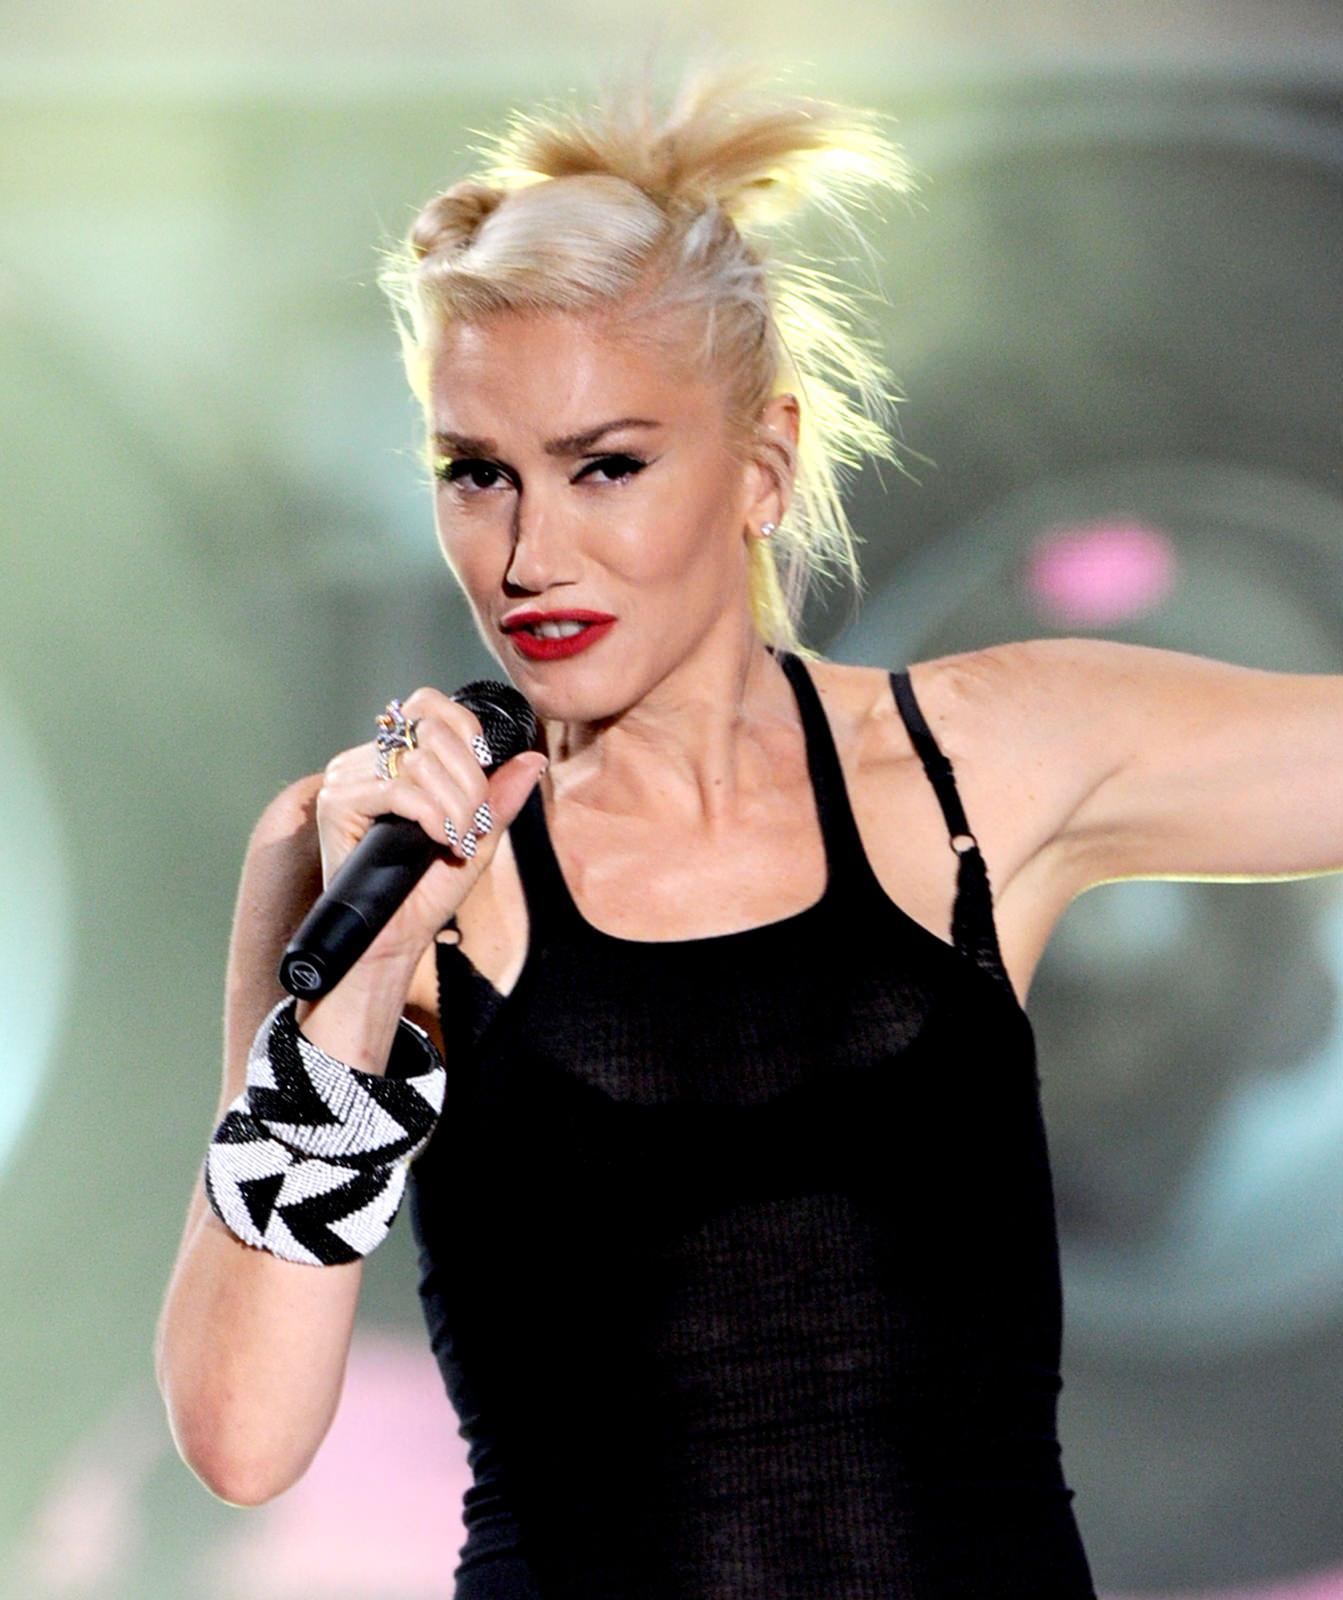 Gwen Stefani Photo Gallery